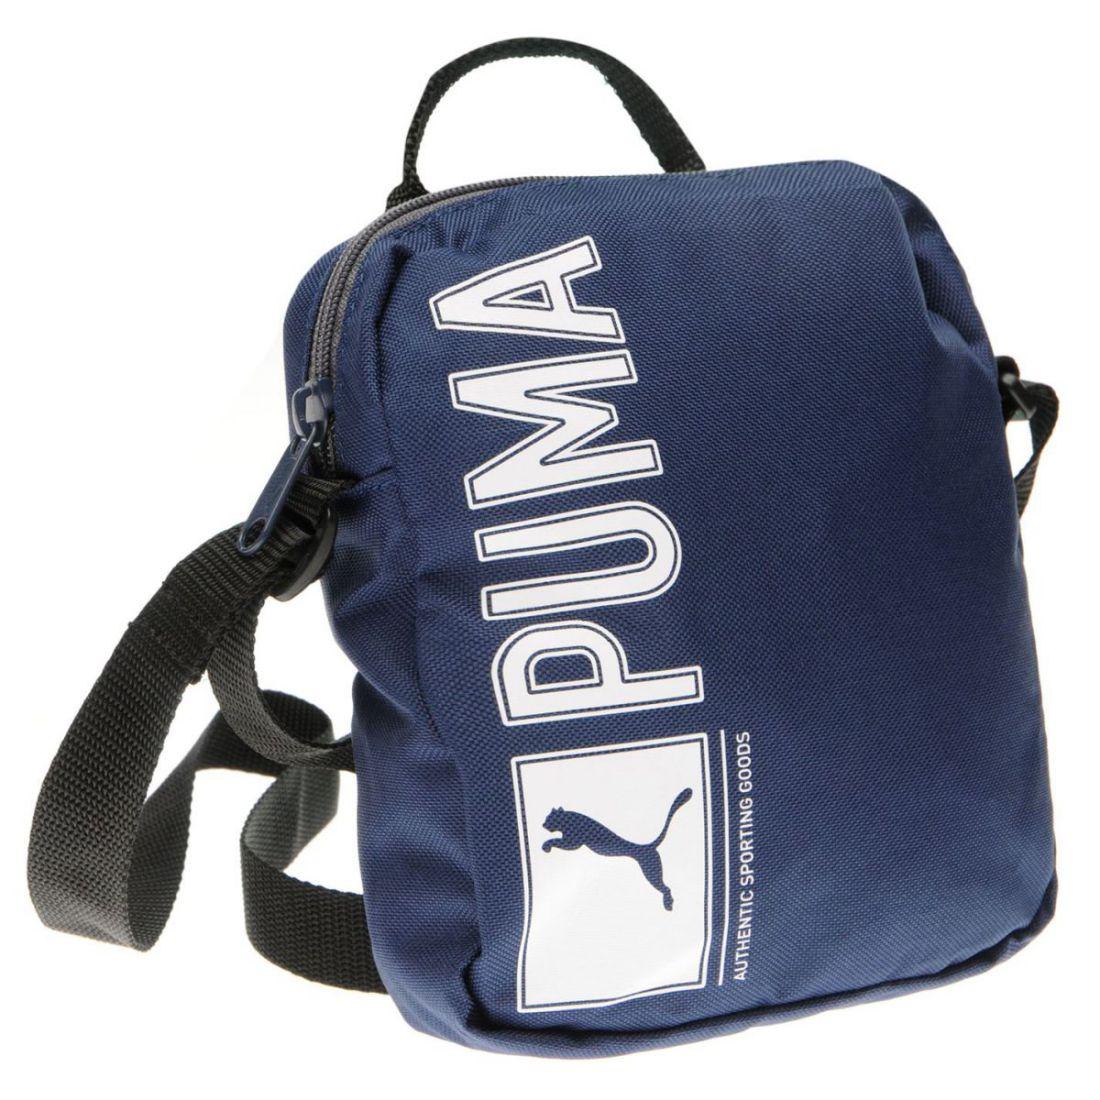 Puma Unisex Pioneer Portable Organiser Bag Shoulder Zip ... 1bed40acf7f